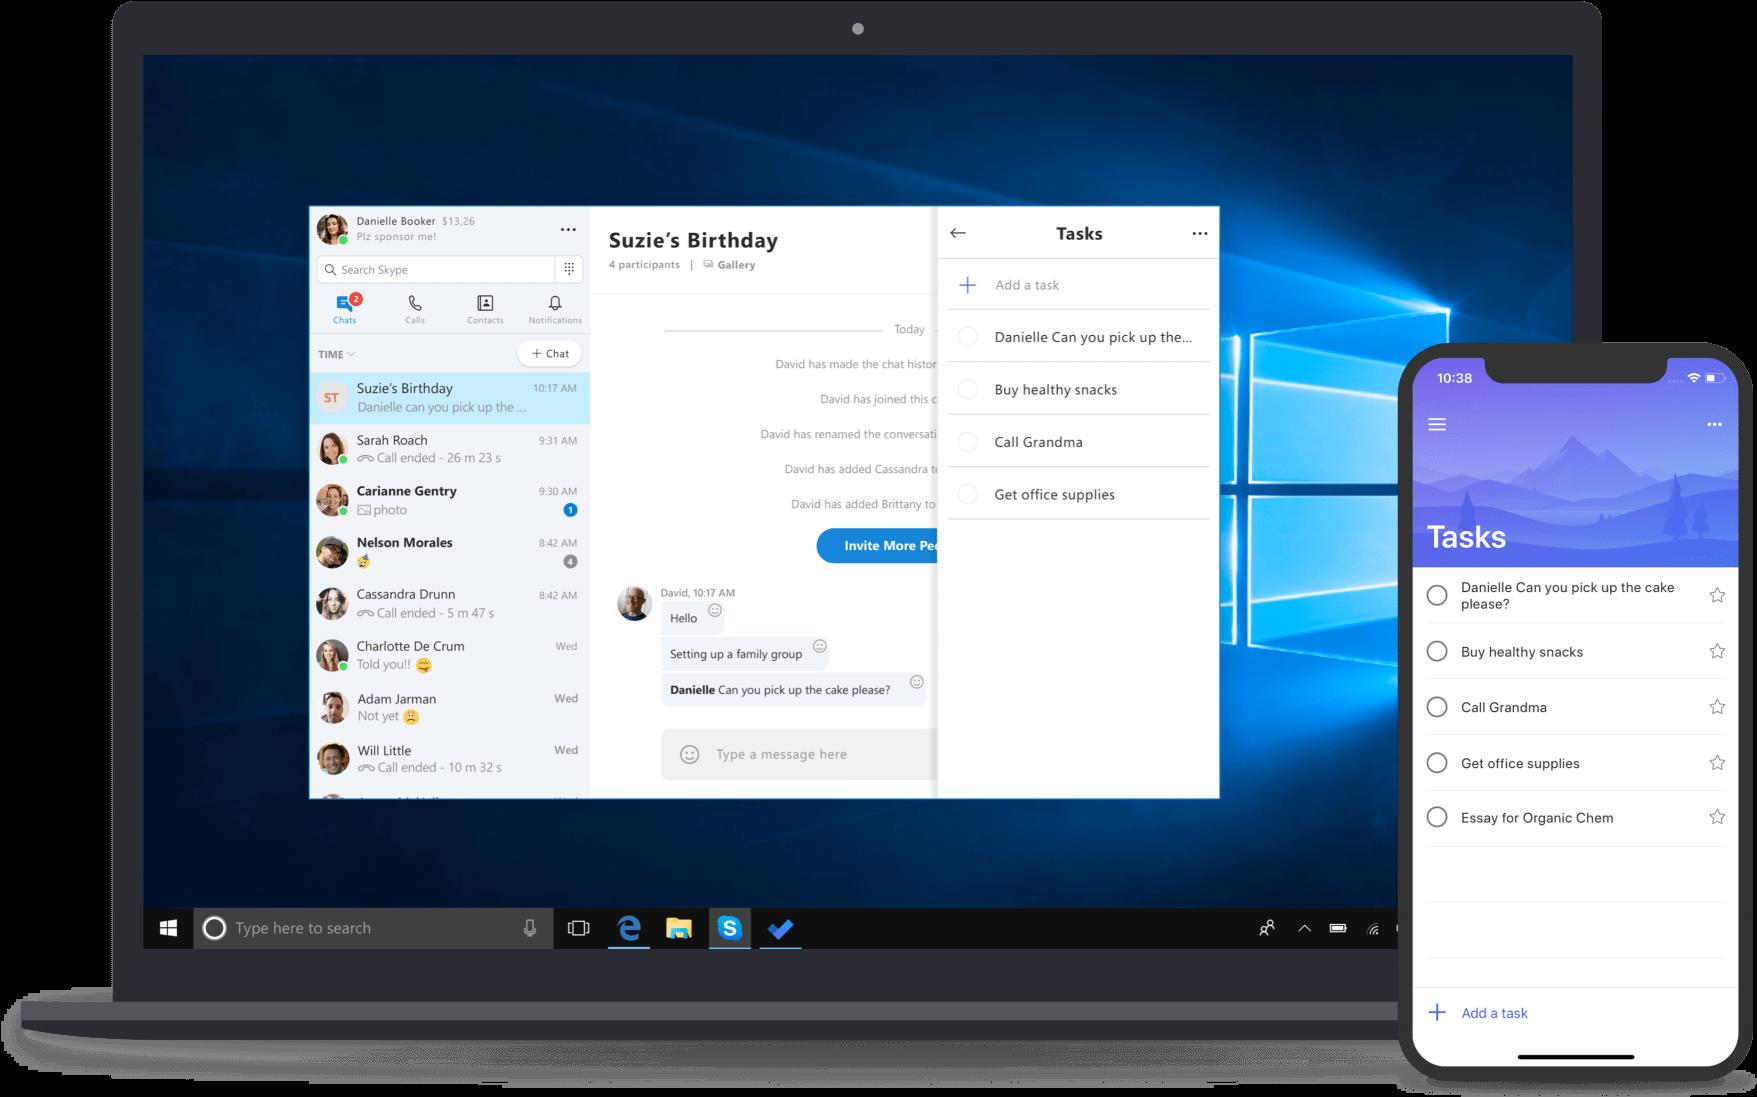 Download Skype Lite For Windows 7 32 Bit